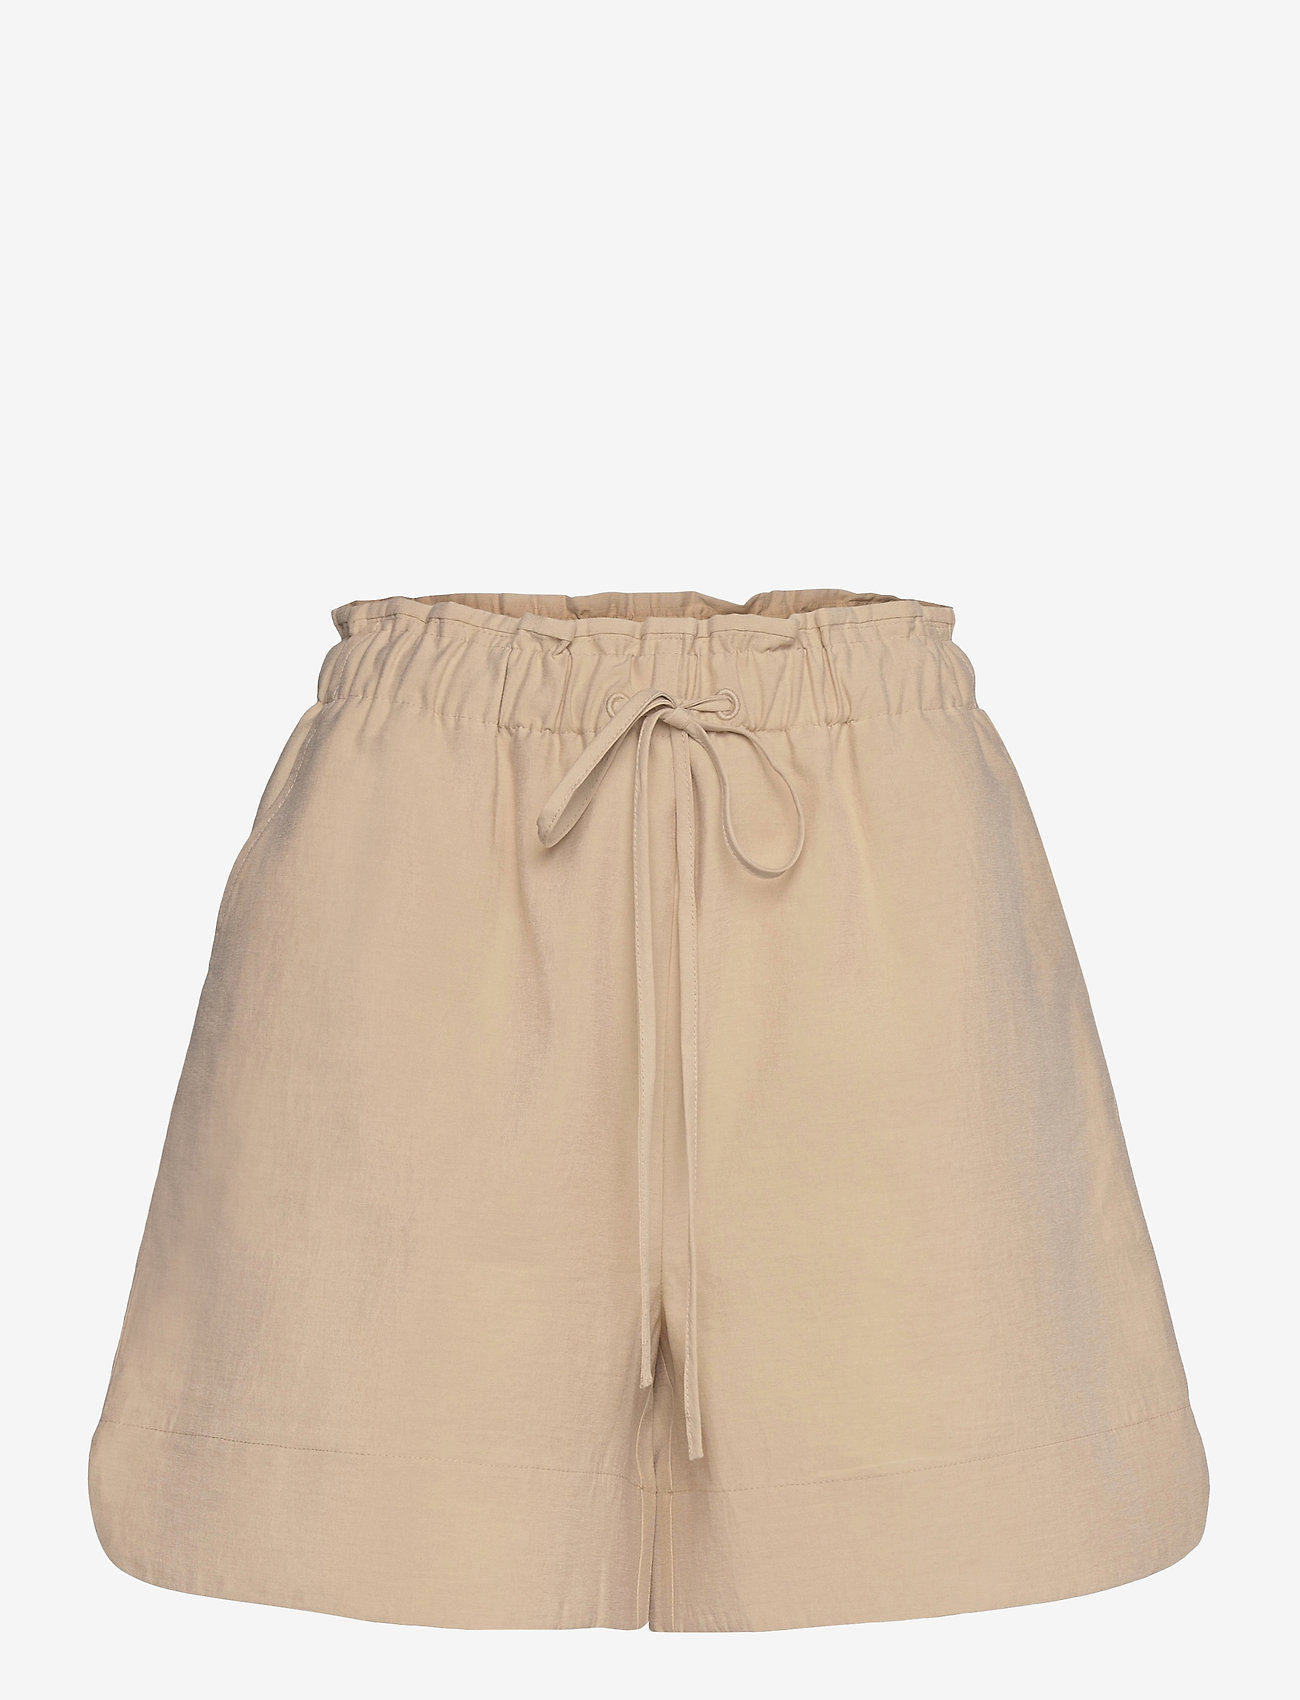 RODEBJER - RODEBJER MILA - paper bag shorts - linen - 0